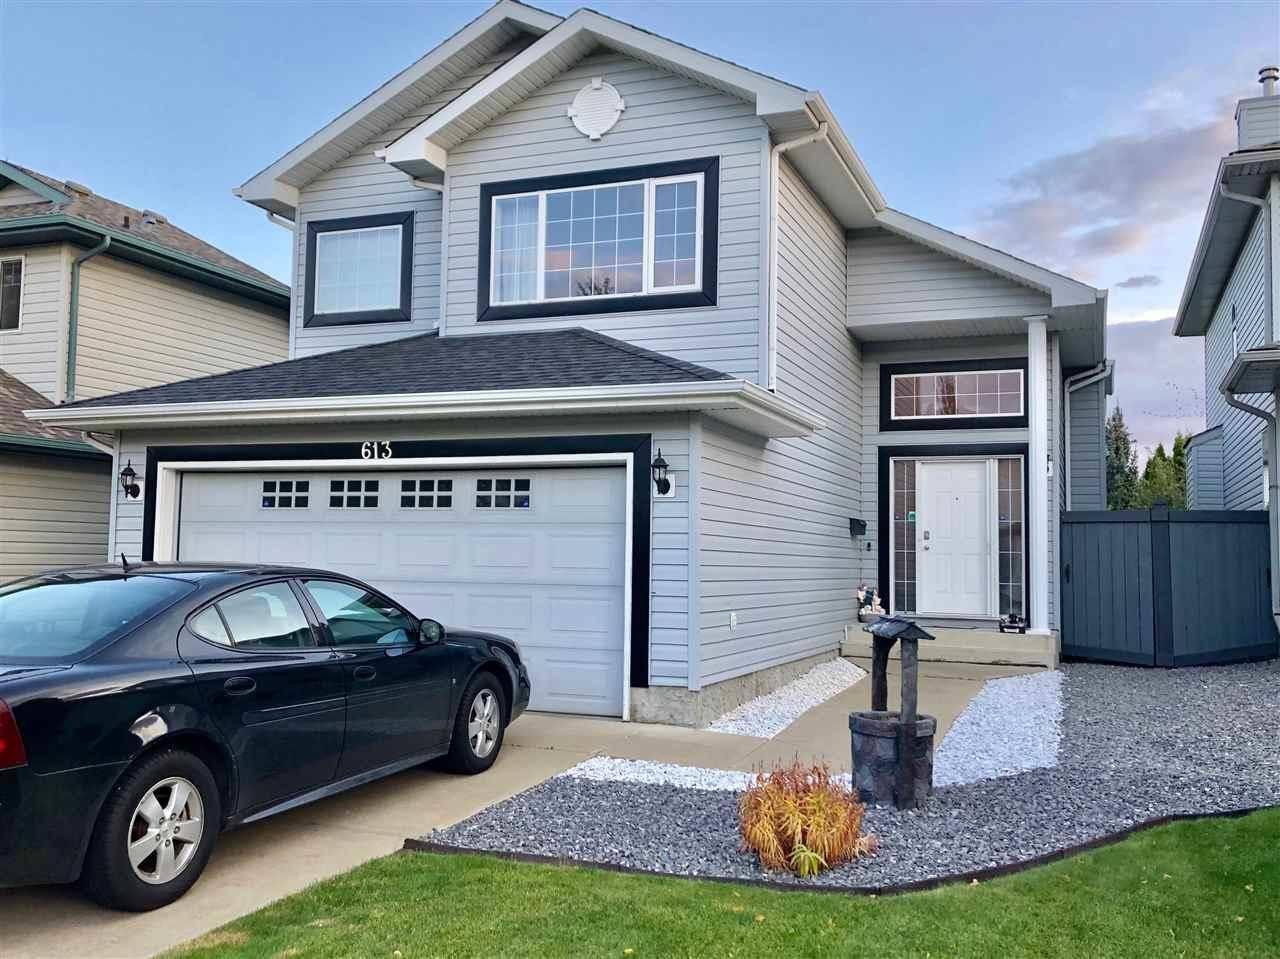 House for sale at 613 Beck Cs Sw Edmonton Alberta - MLS: E4174944